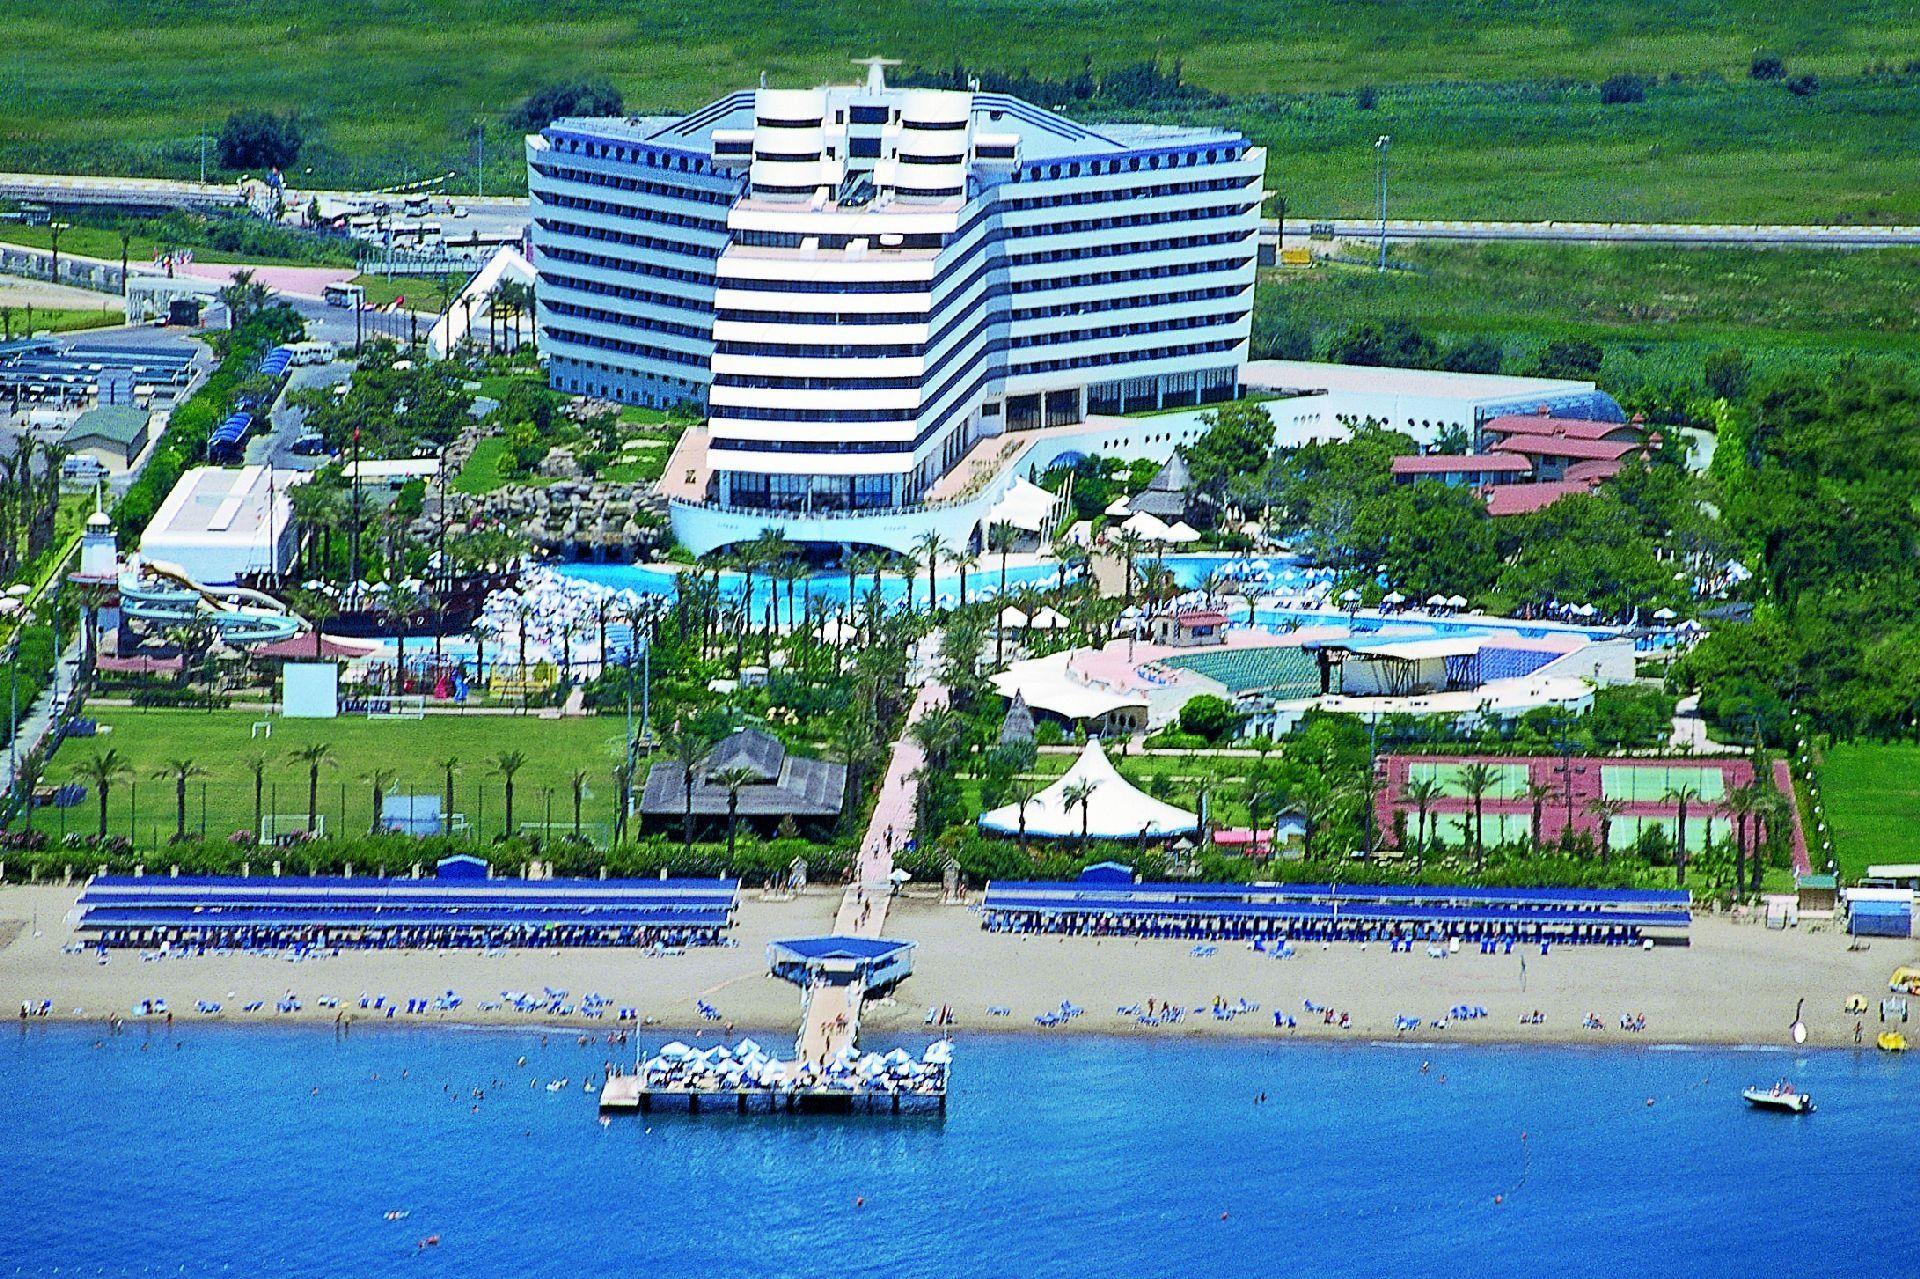 Titanic Hotel In Lara Antalya Beach Resorts Wishes Fireworks Hotel